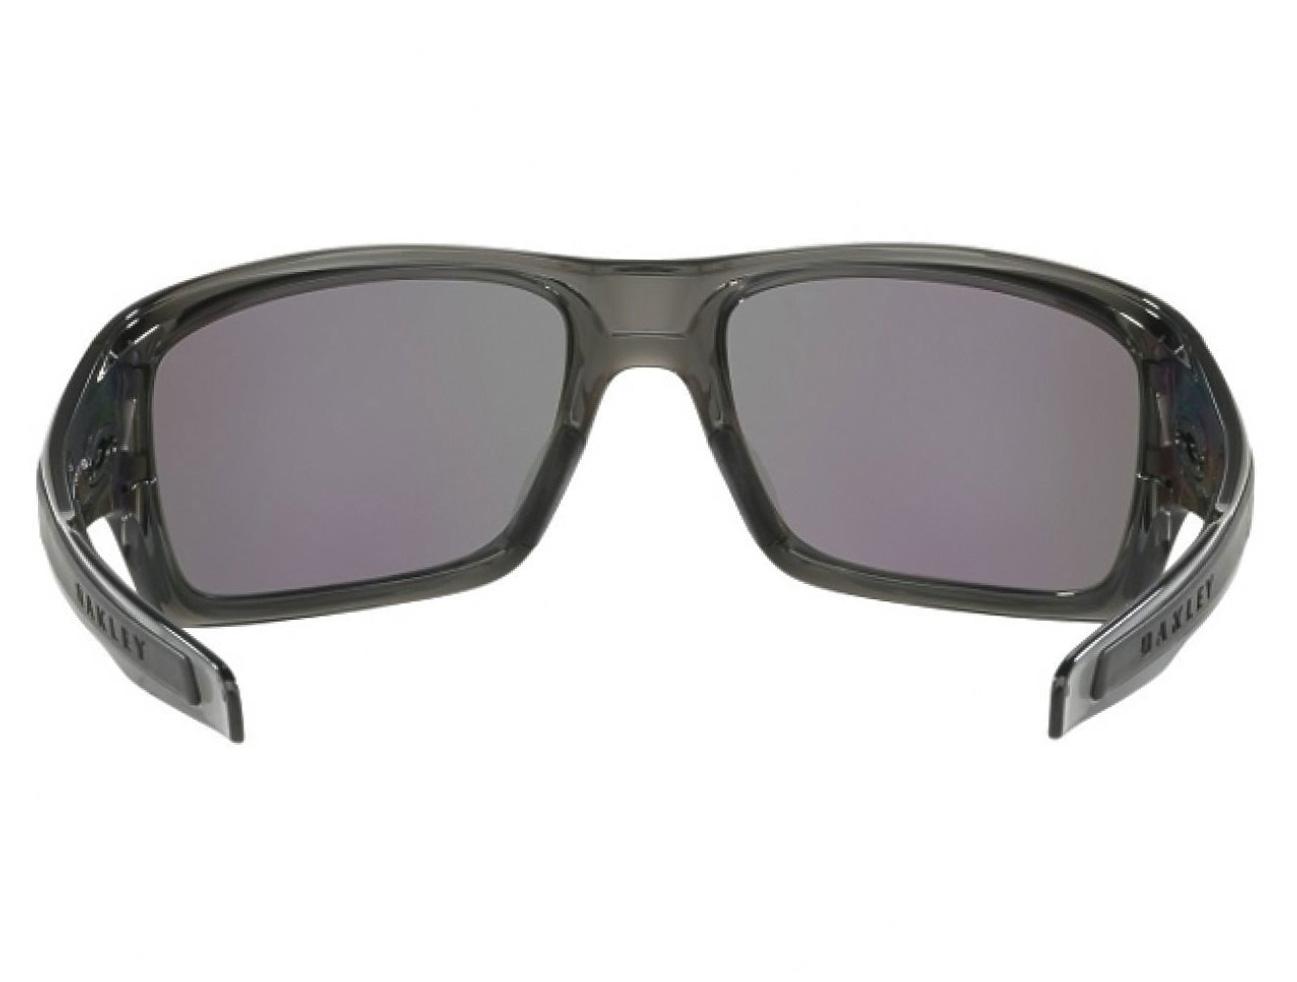 b44ff396429 Sentinel Oakley Sunglasses - Turbine - Grey Smoke